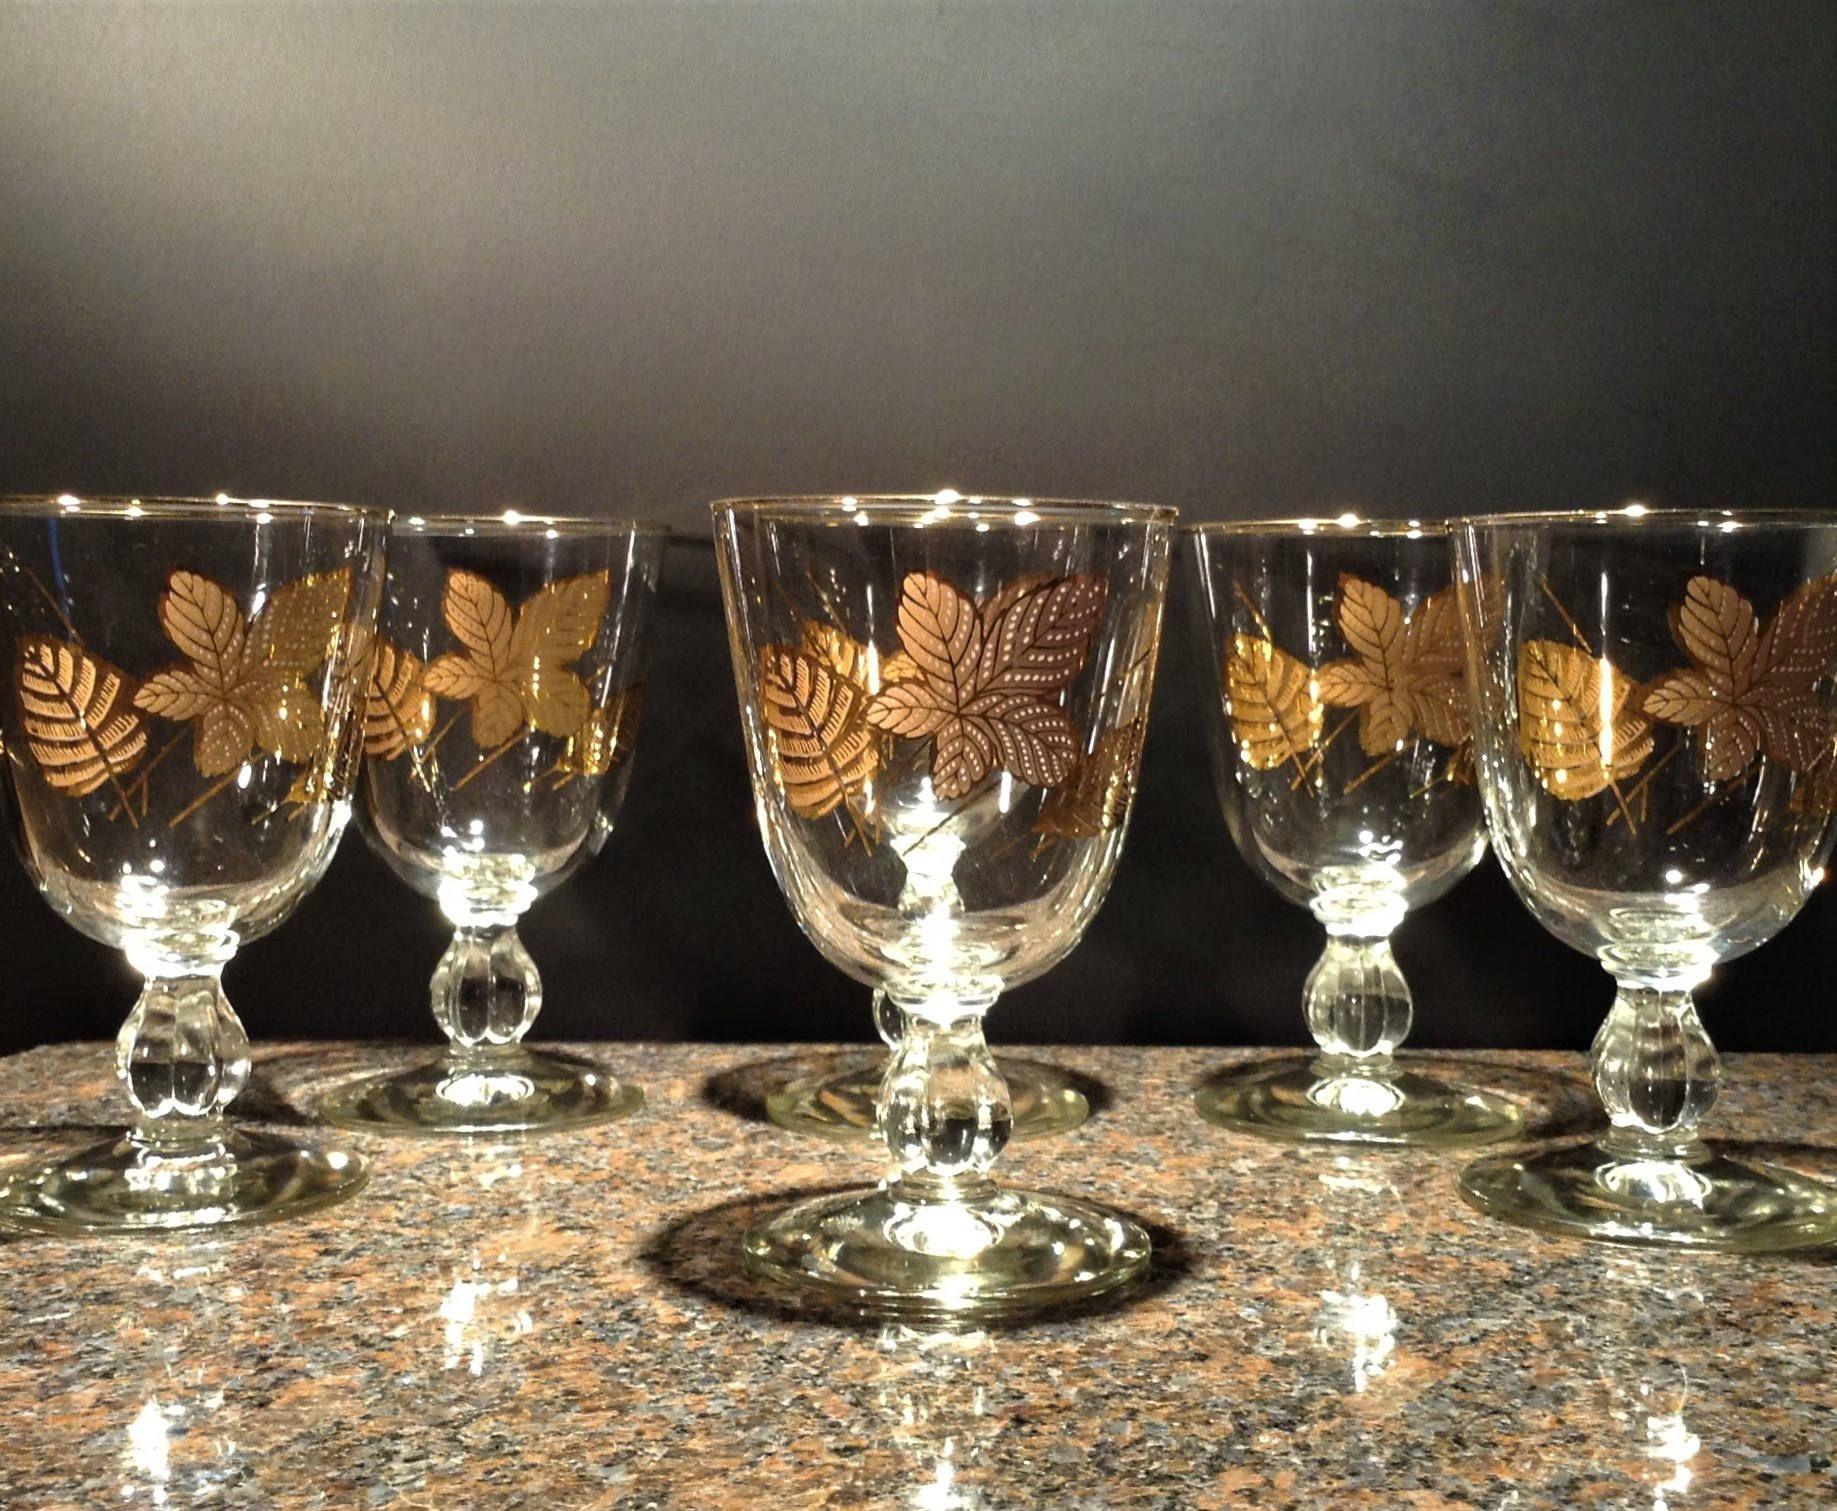 vintage-cocktail-glassware-large-penis-seinfeld